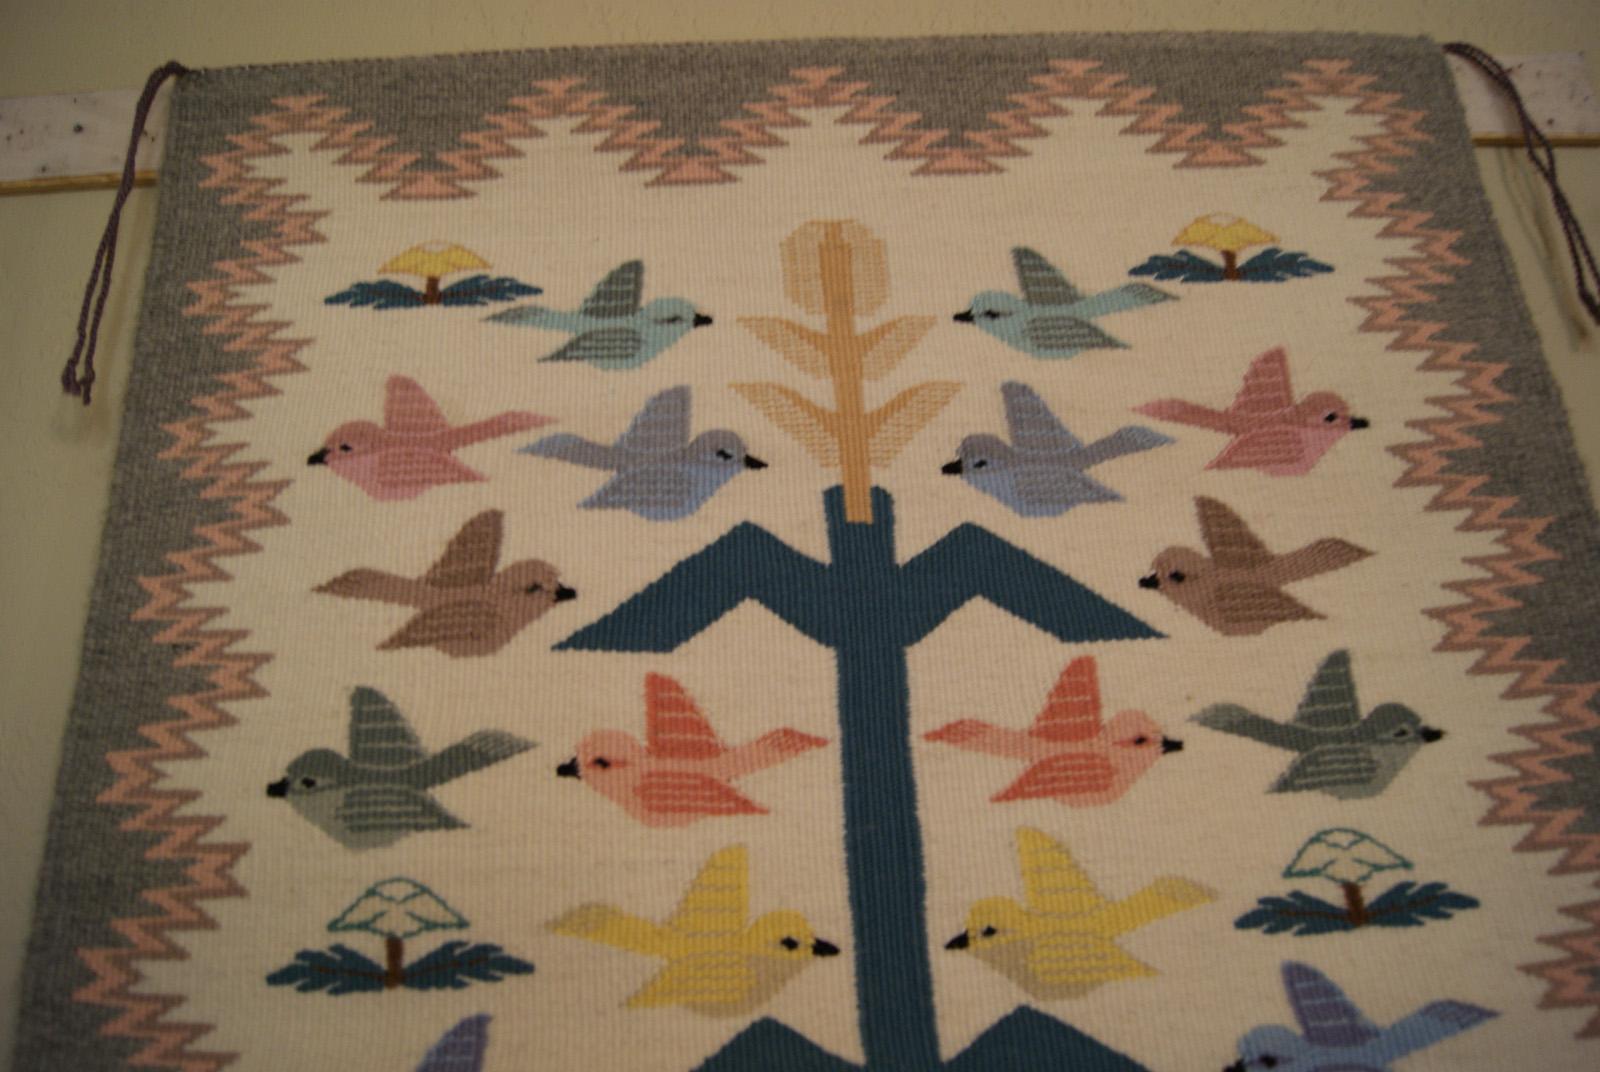 Tree Of Life Navajo Weaving With 28 Birds